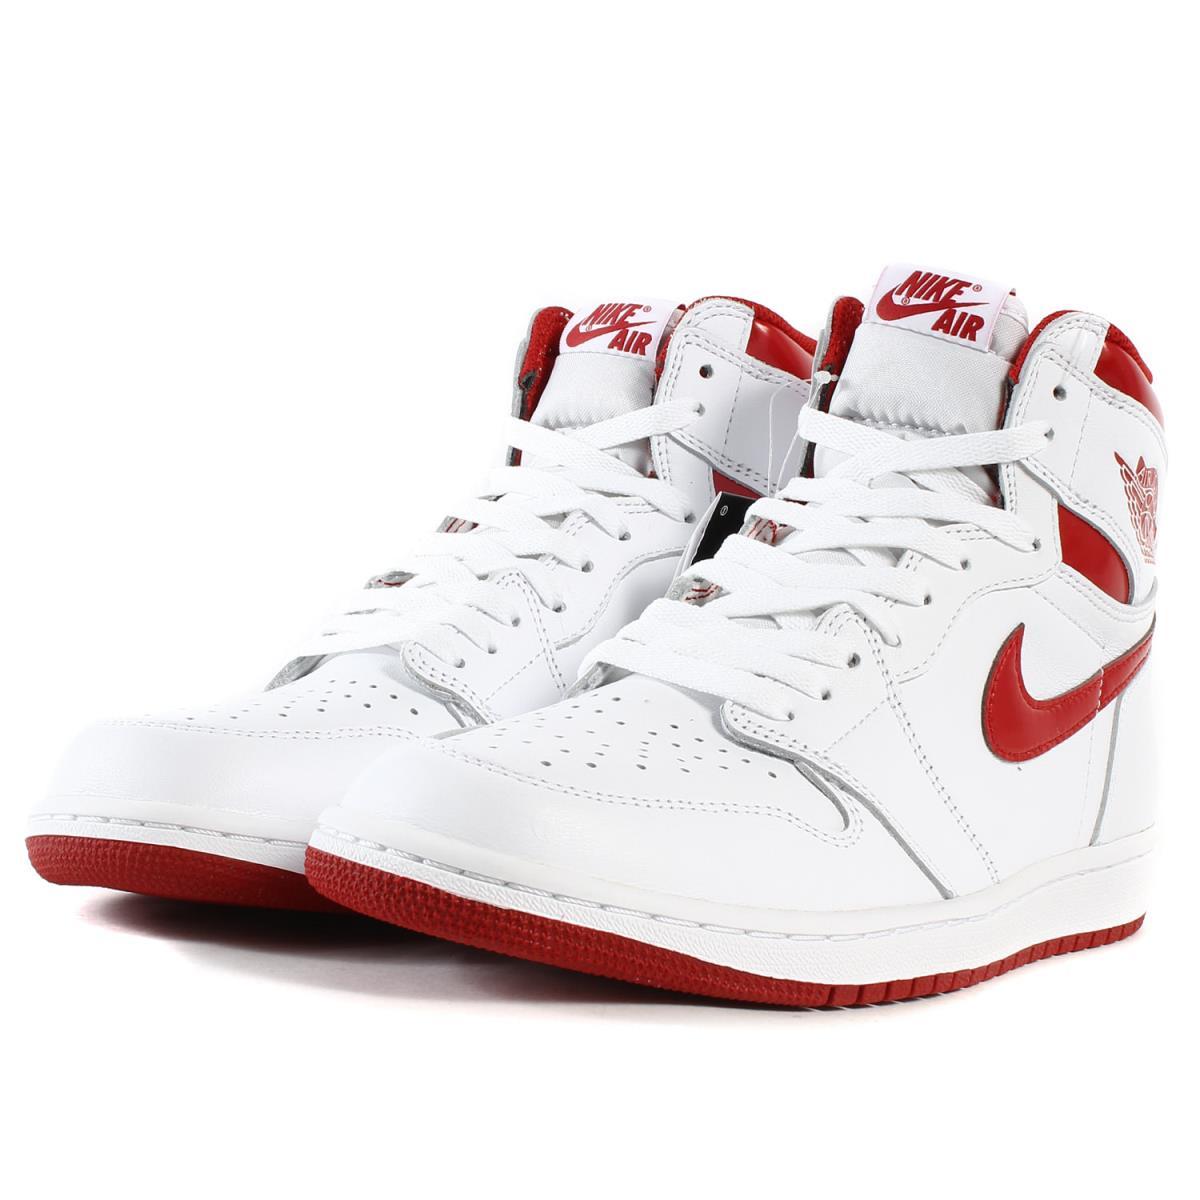 sale retailer caa43 d3813 NIKE (Nike) AIR JORDAN 1 RETRO HIGH OG METALLIC RED (555,088-103) white X  bar city red US10.5(28.5cm)